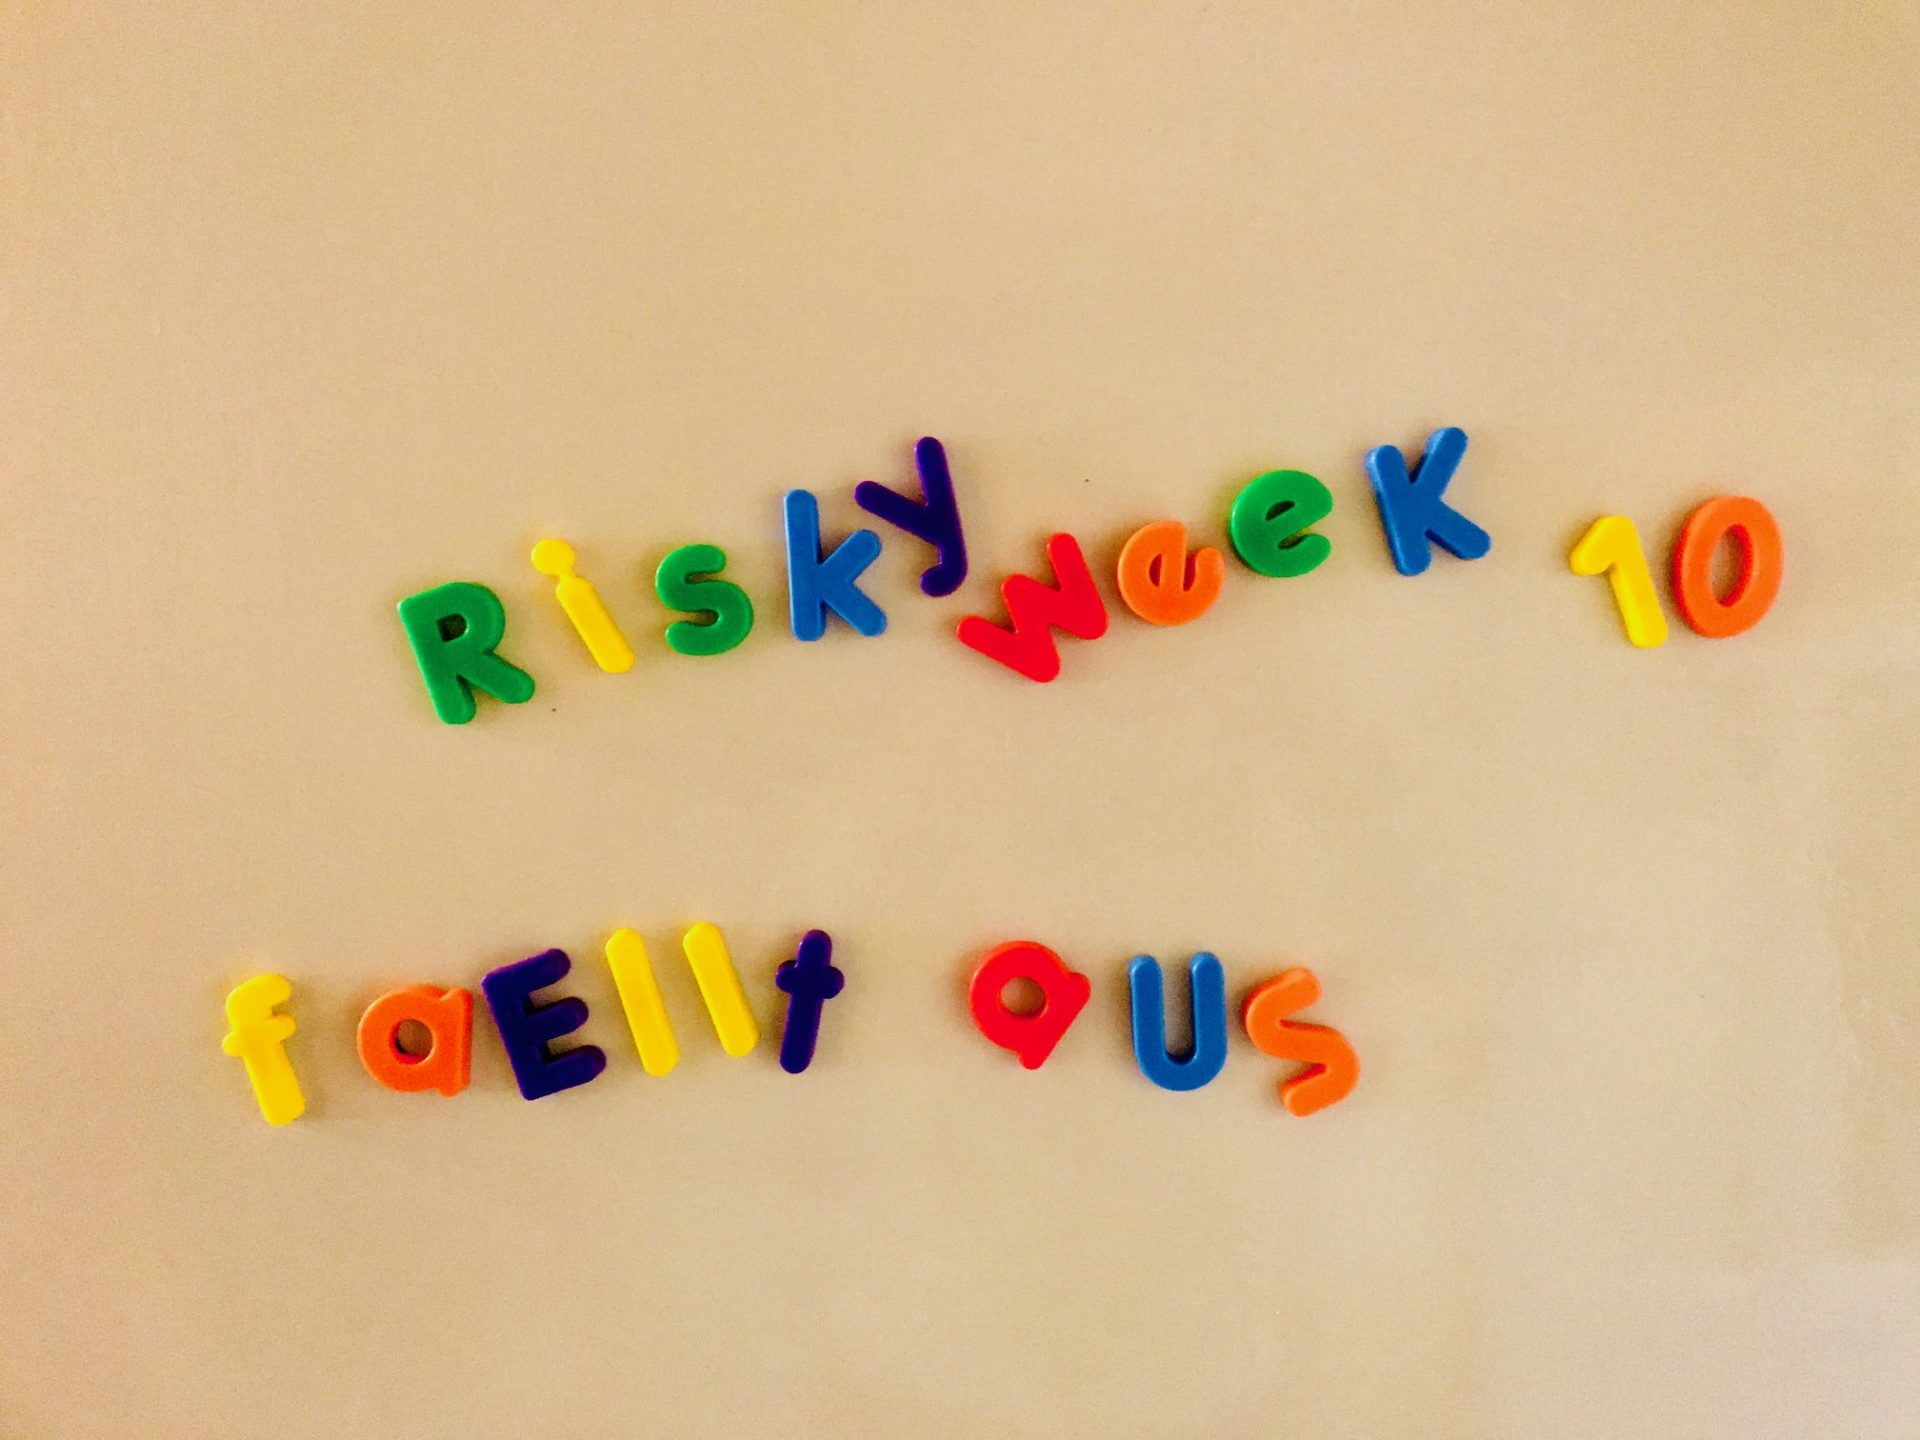 Risky Week 10 fällt aus